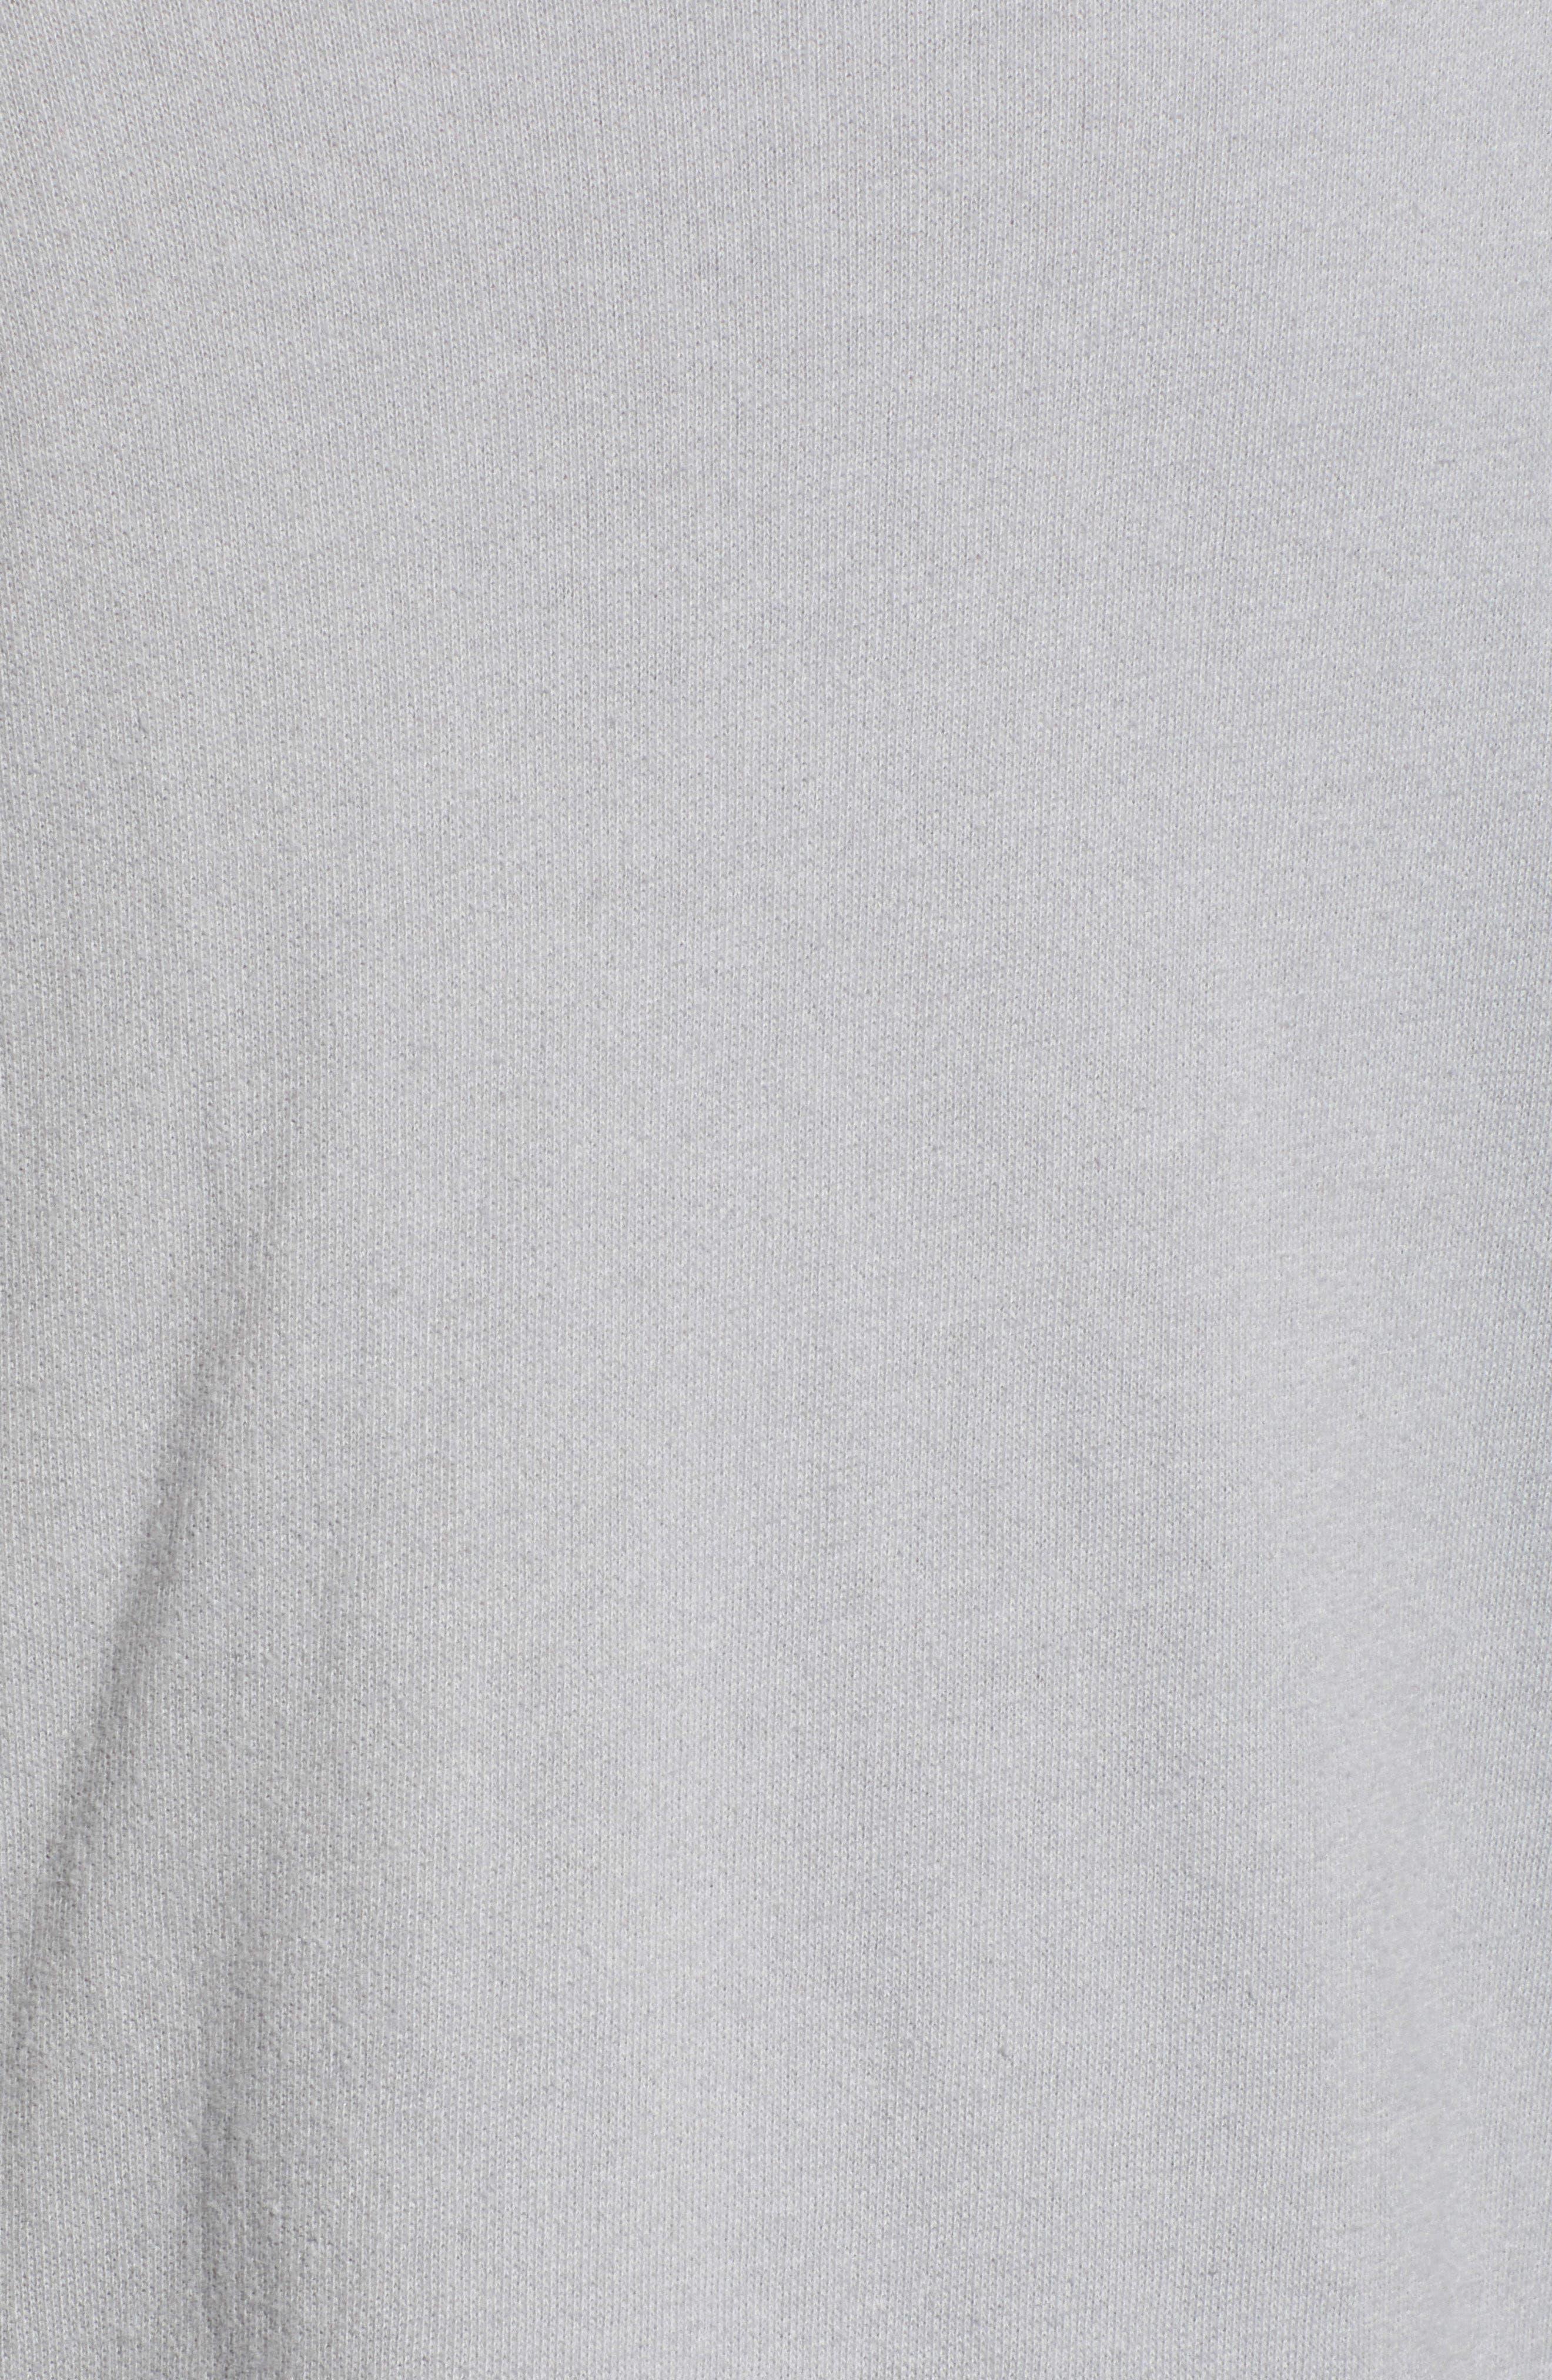 Asymmetrical Drape Collar Terry Jacket,                             Alternate thumbnail 6, color,                             GREY